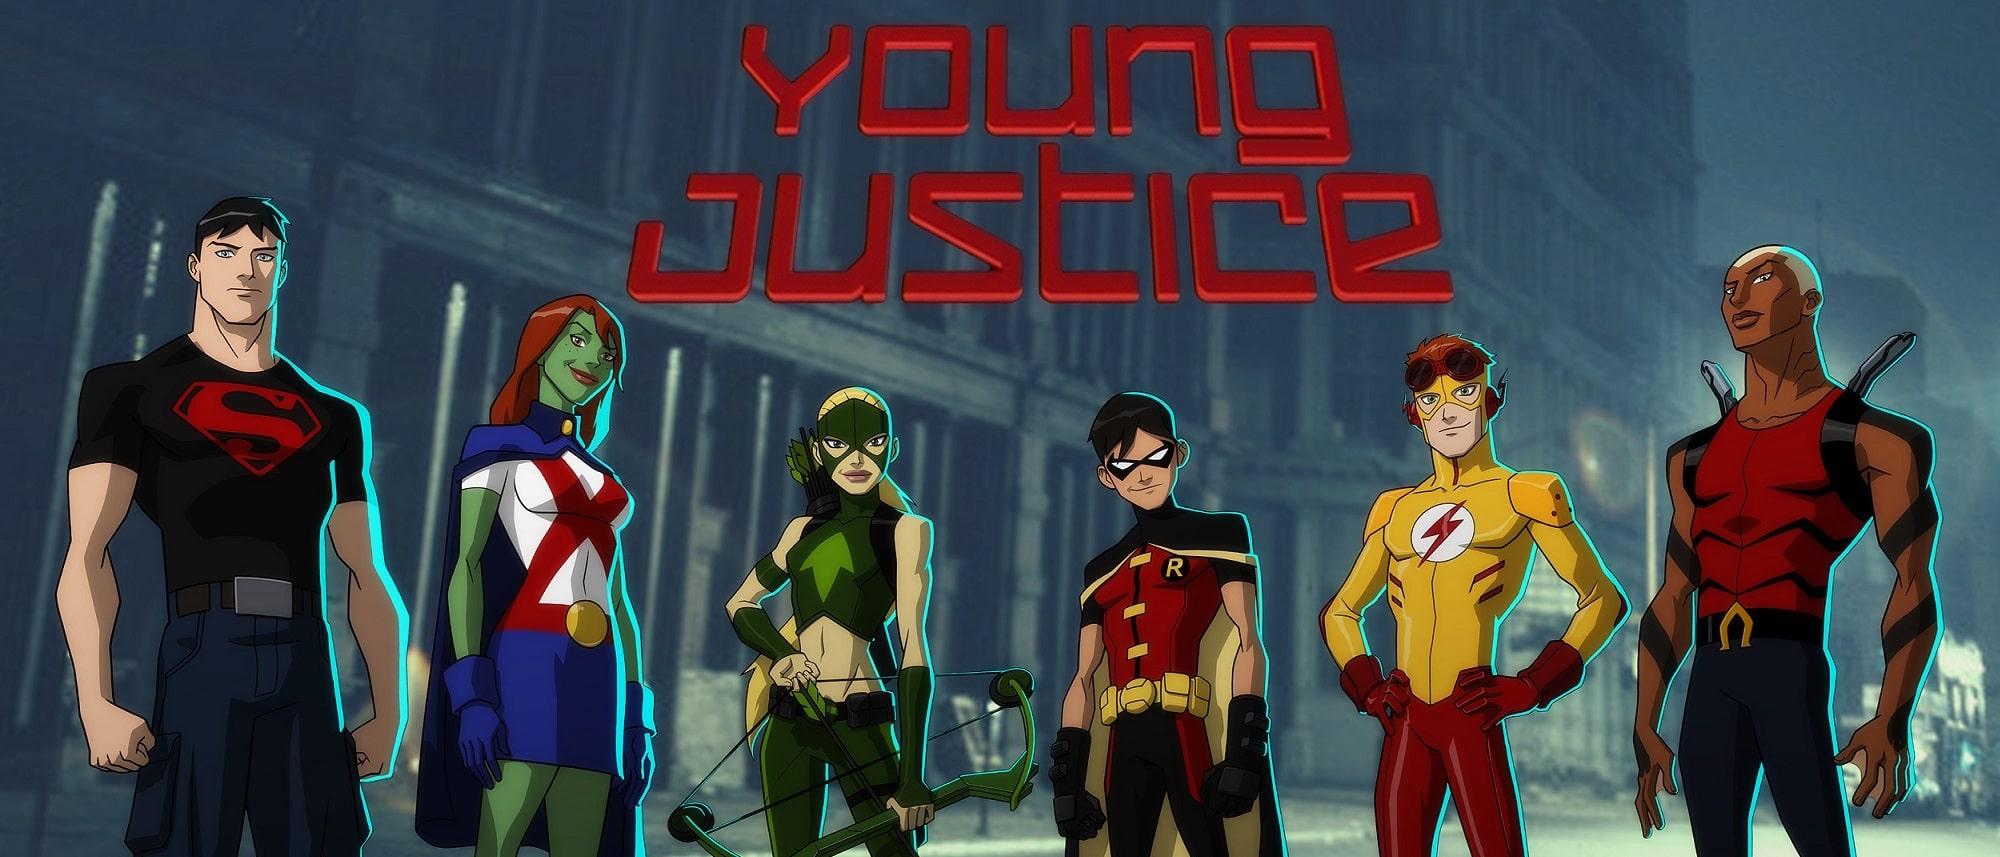 Young-Justice-Season-3